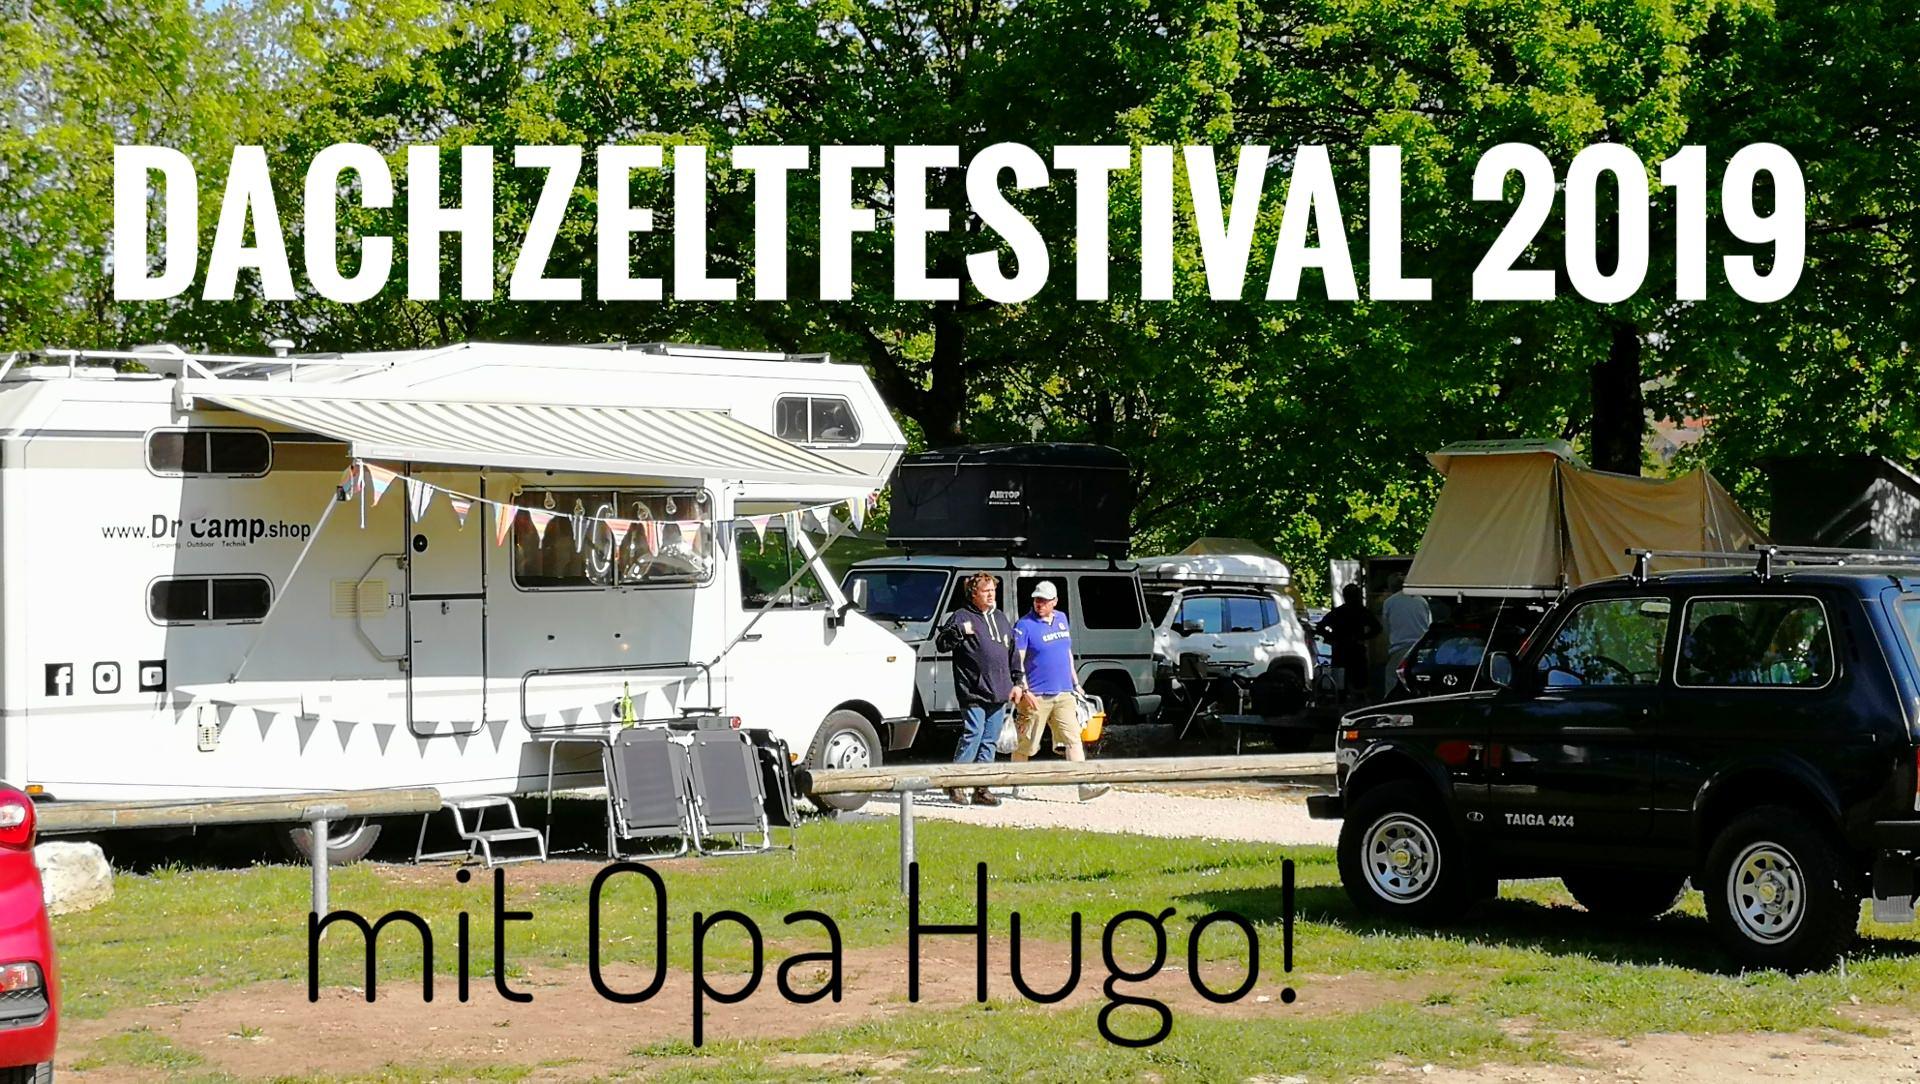 Dachzeltfestival Thumbnail